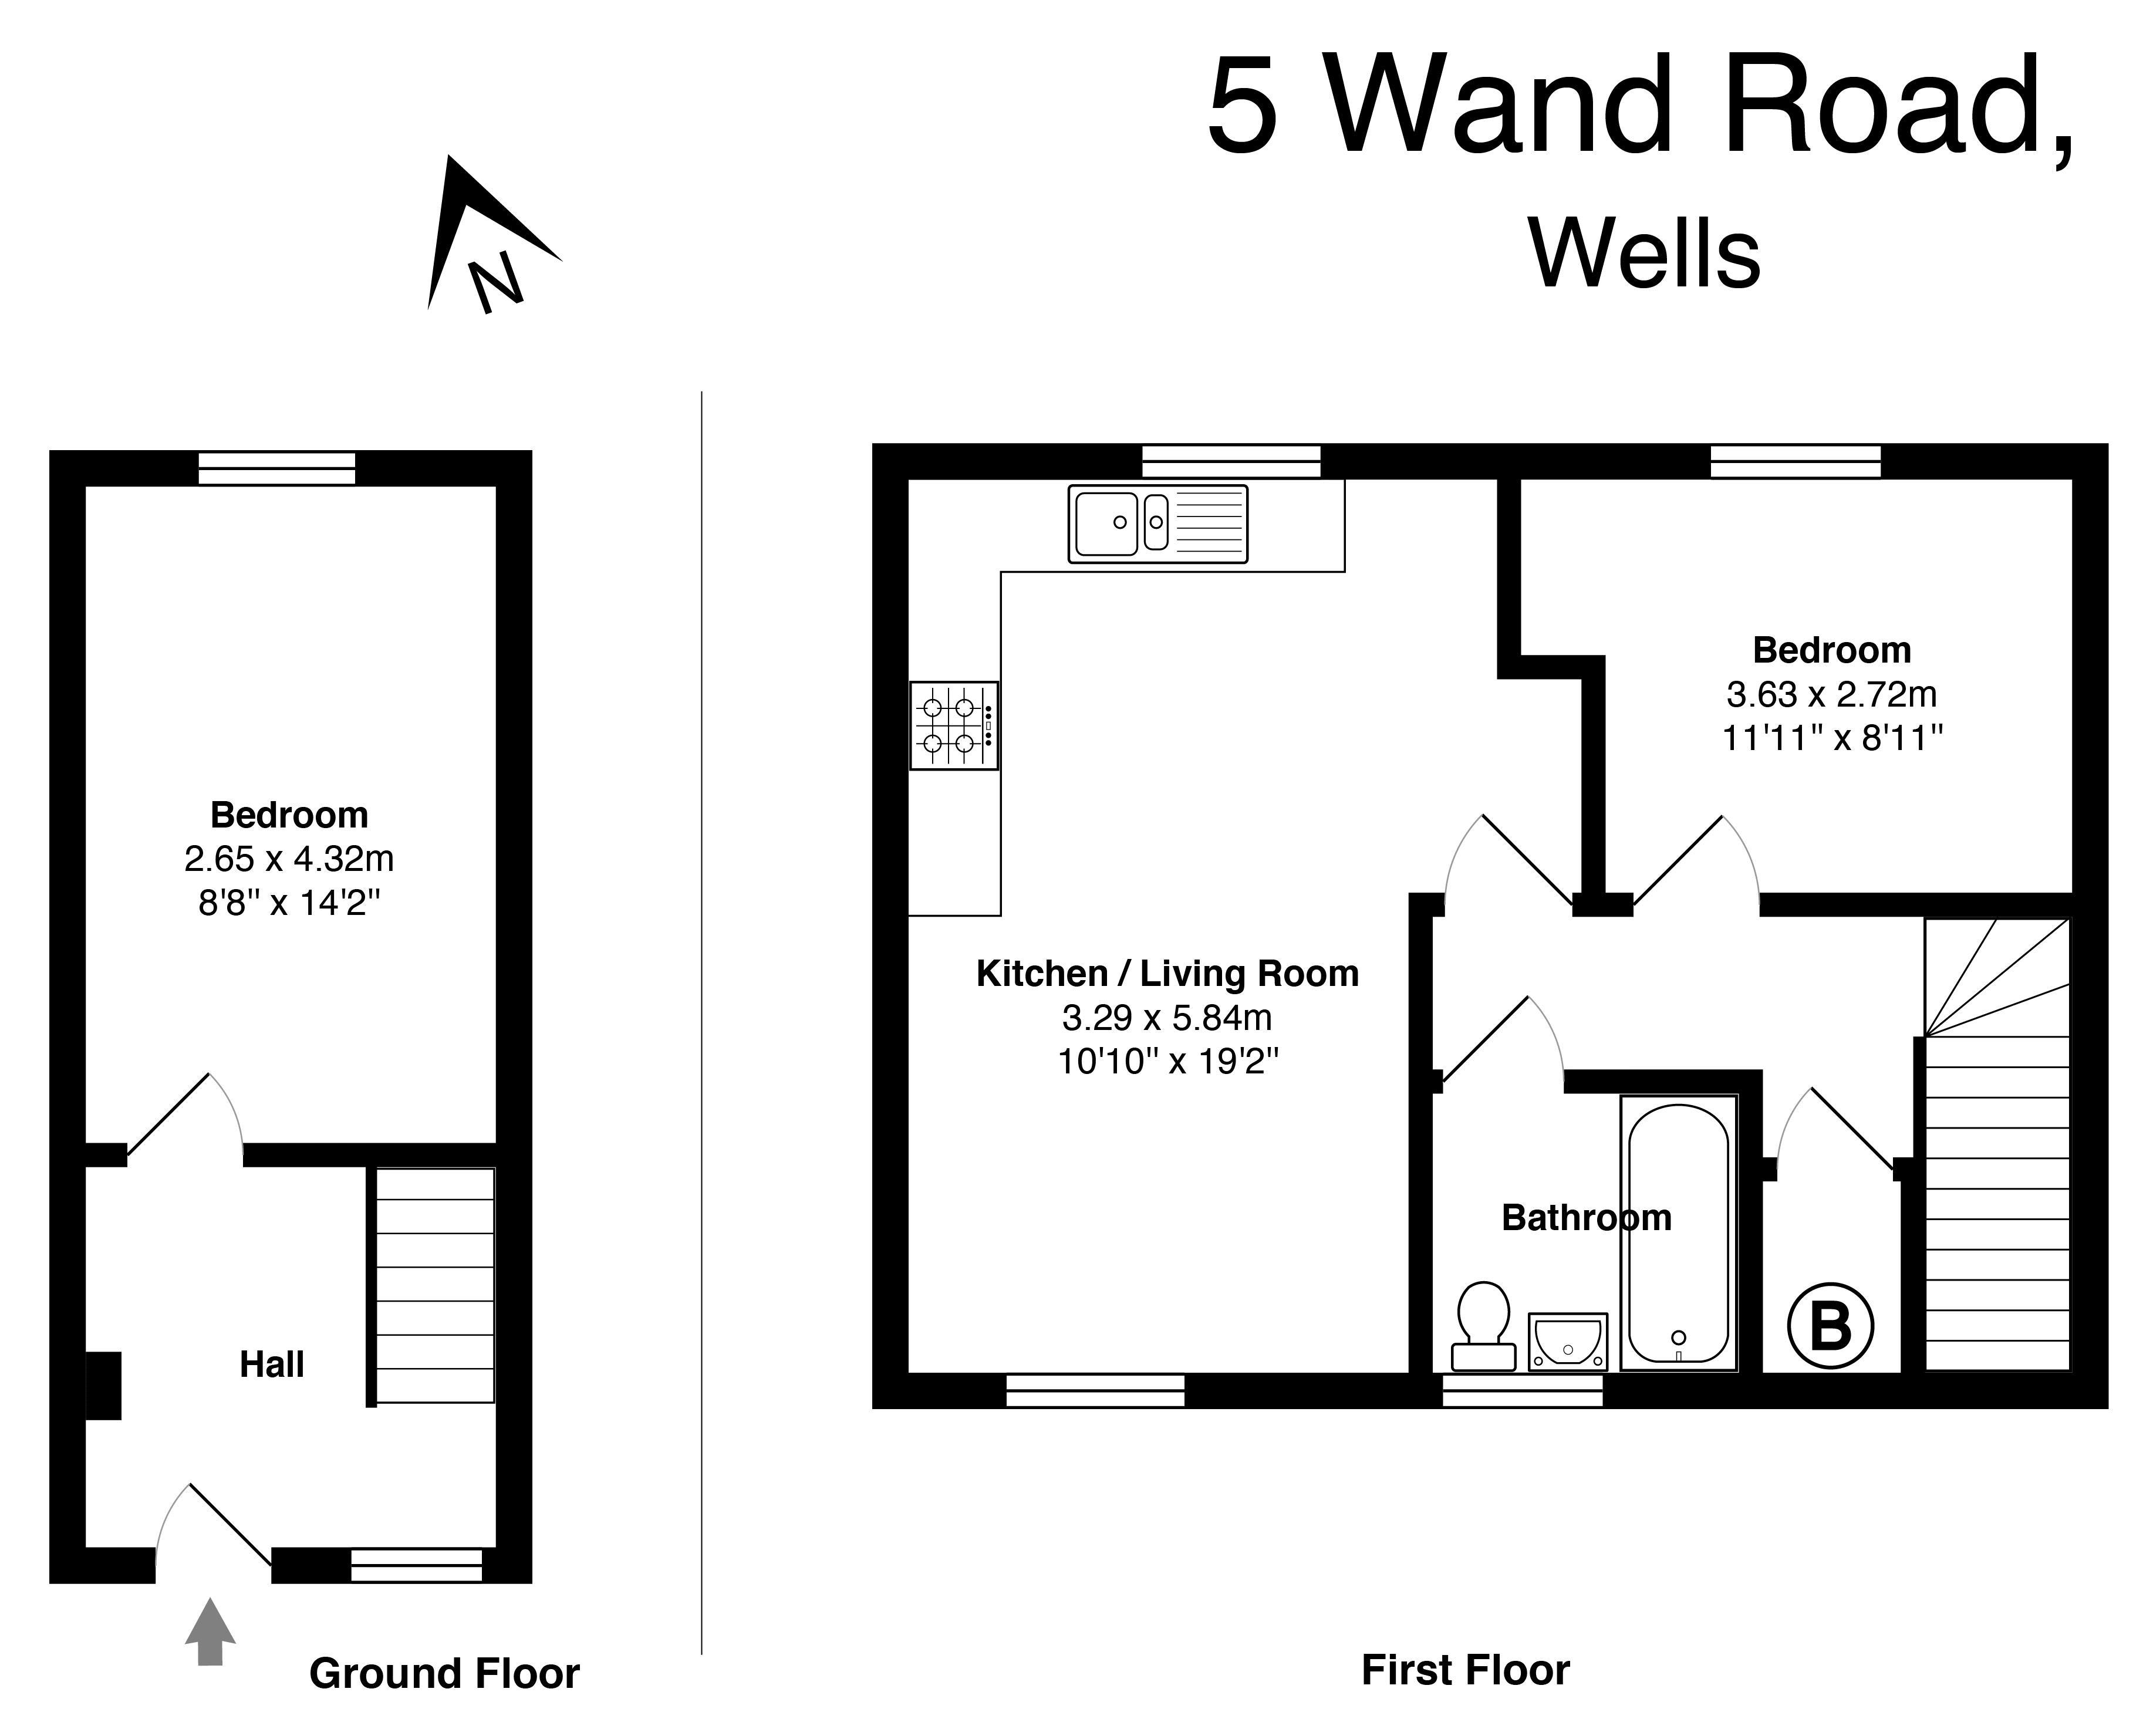 Wand Road